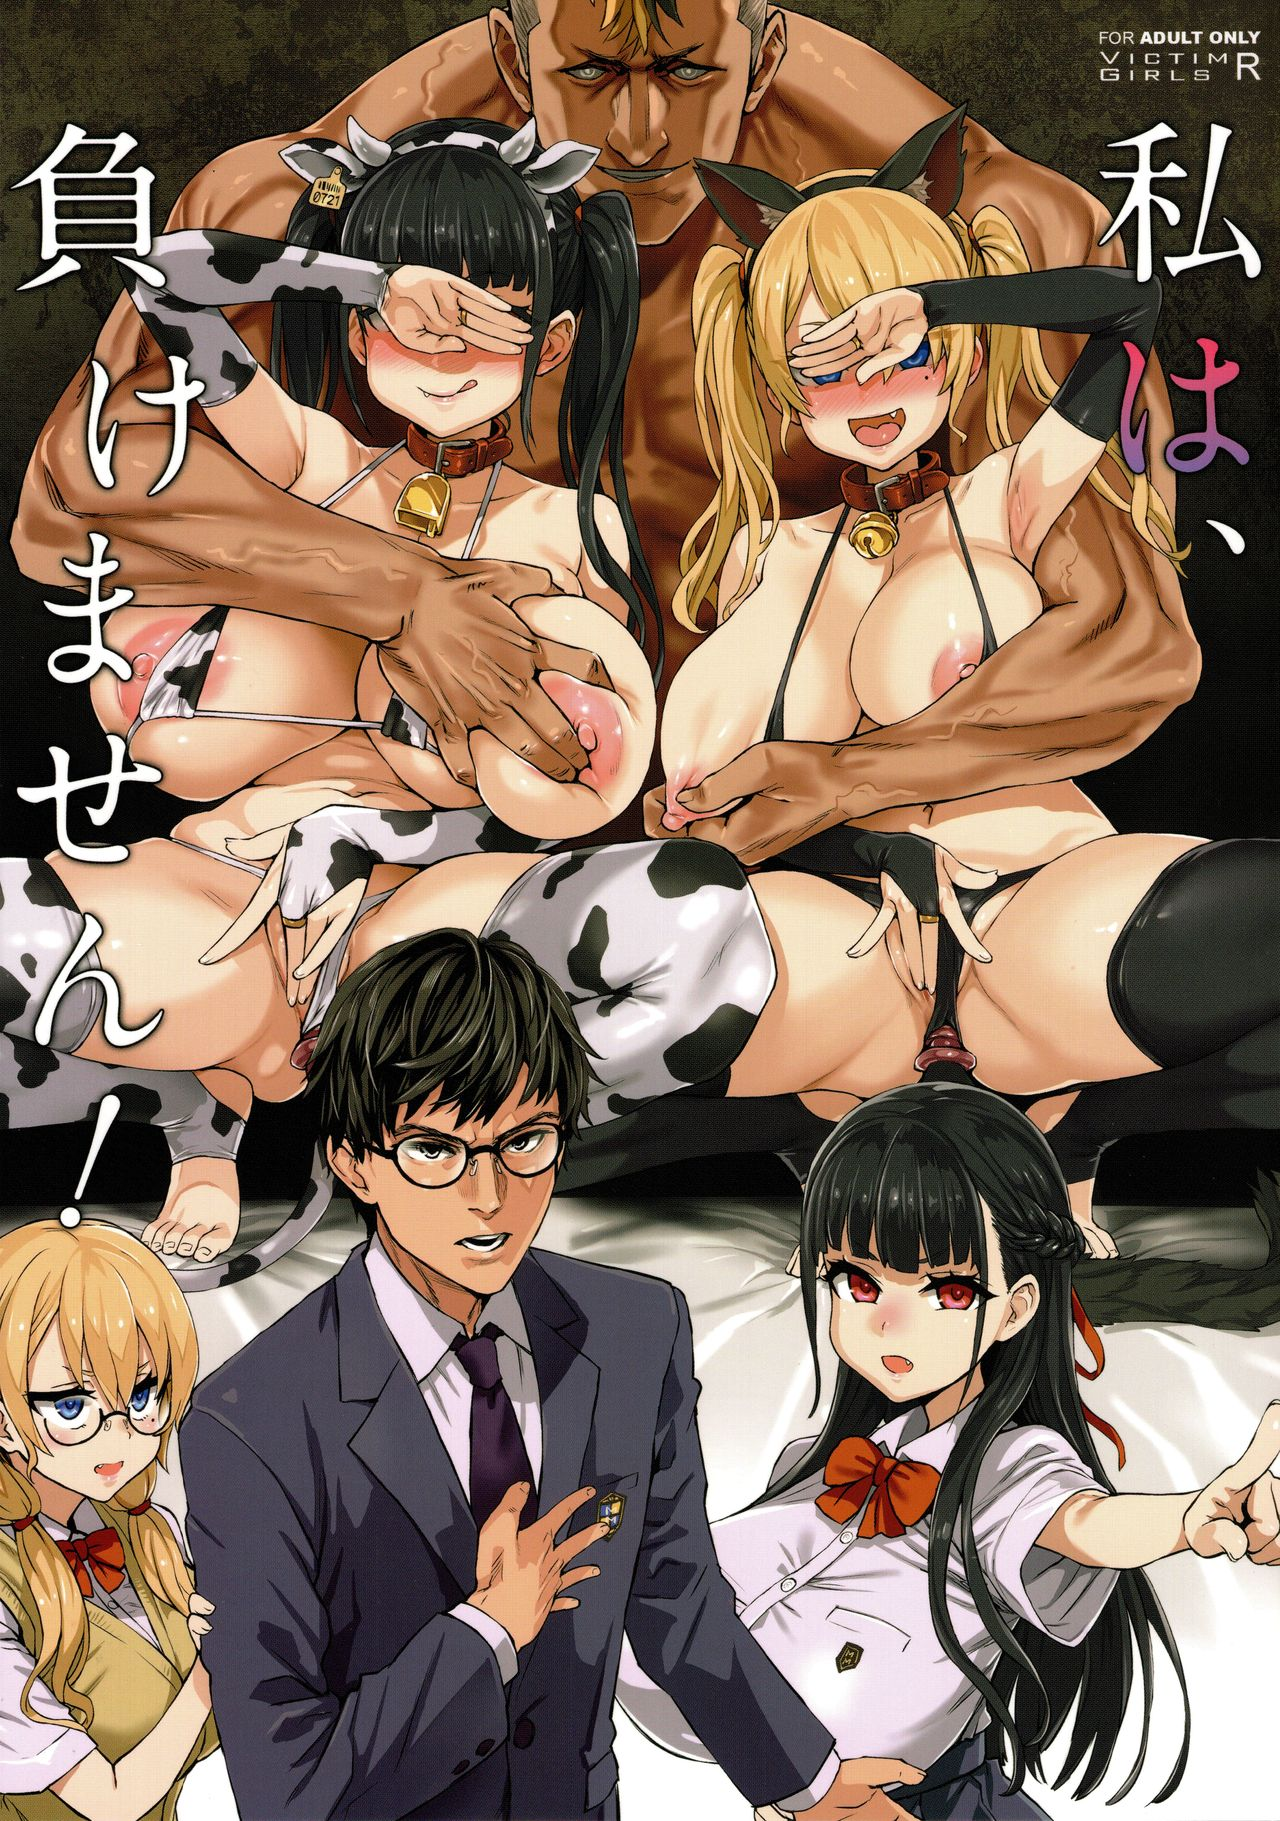 VictimGirlsR Watashi wa, Makemasen!